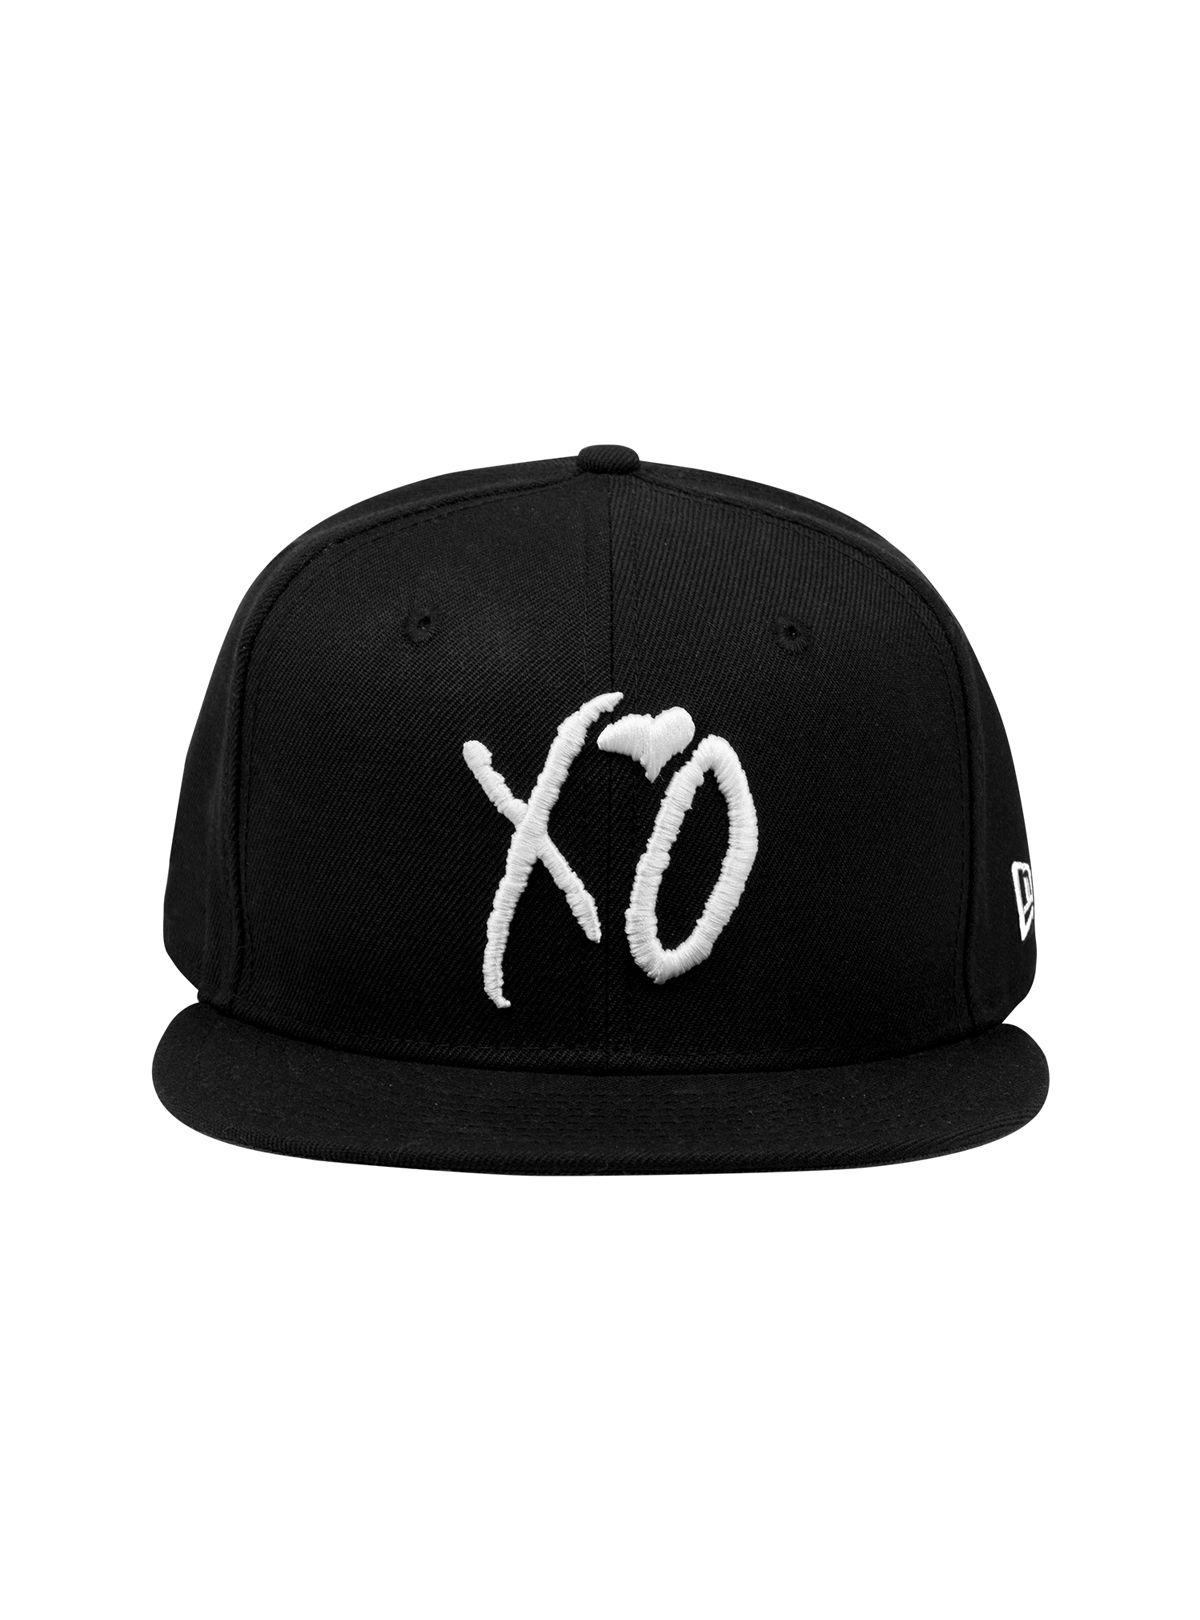 58f87f23ad00a The Weeknd XO Classic Logo New Era 9Fifty Snapback